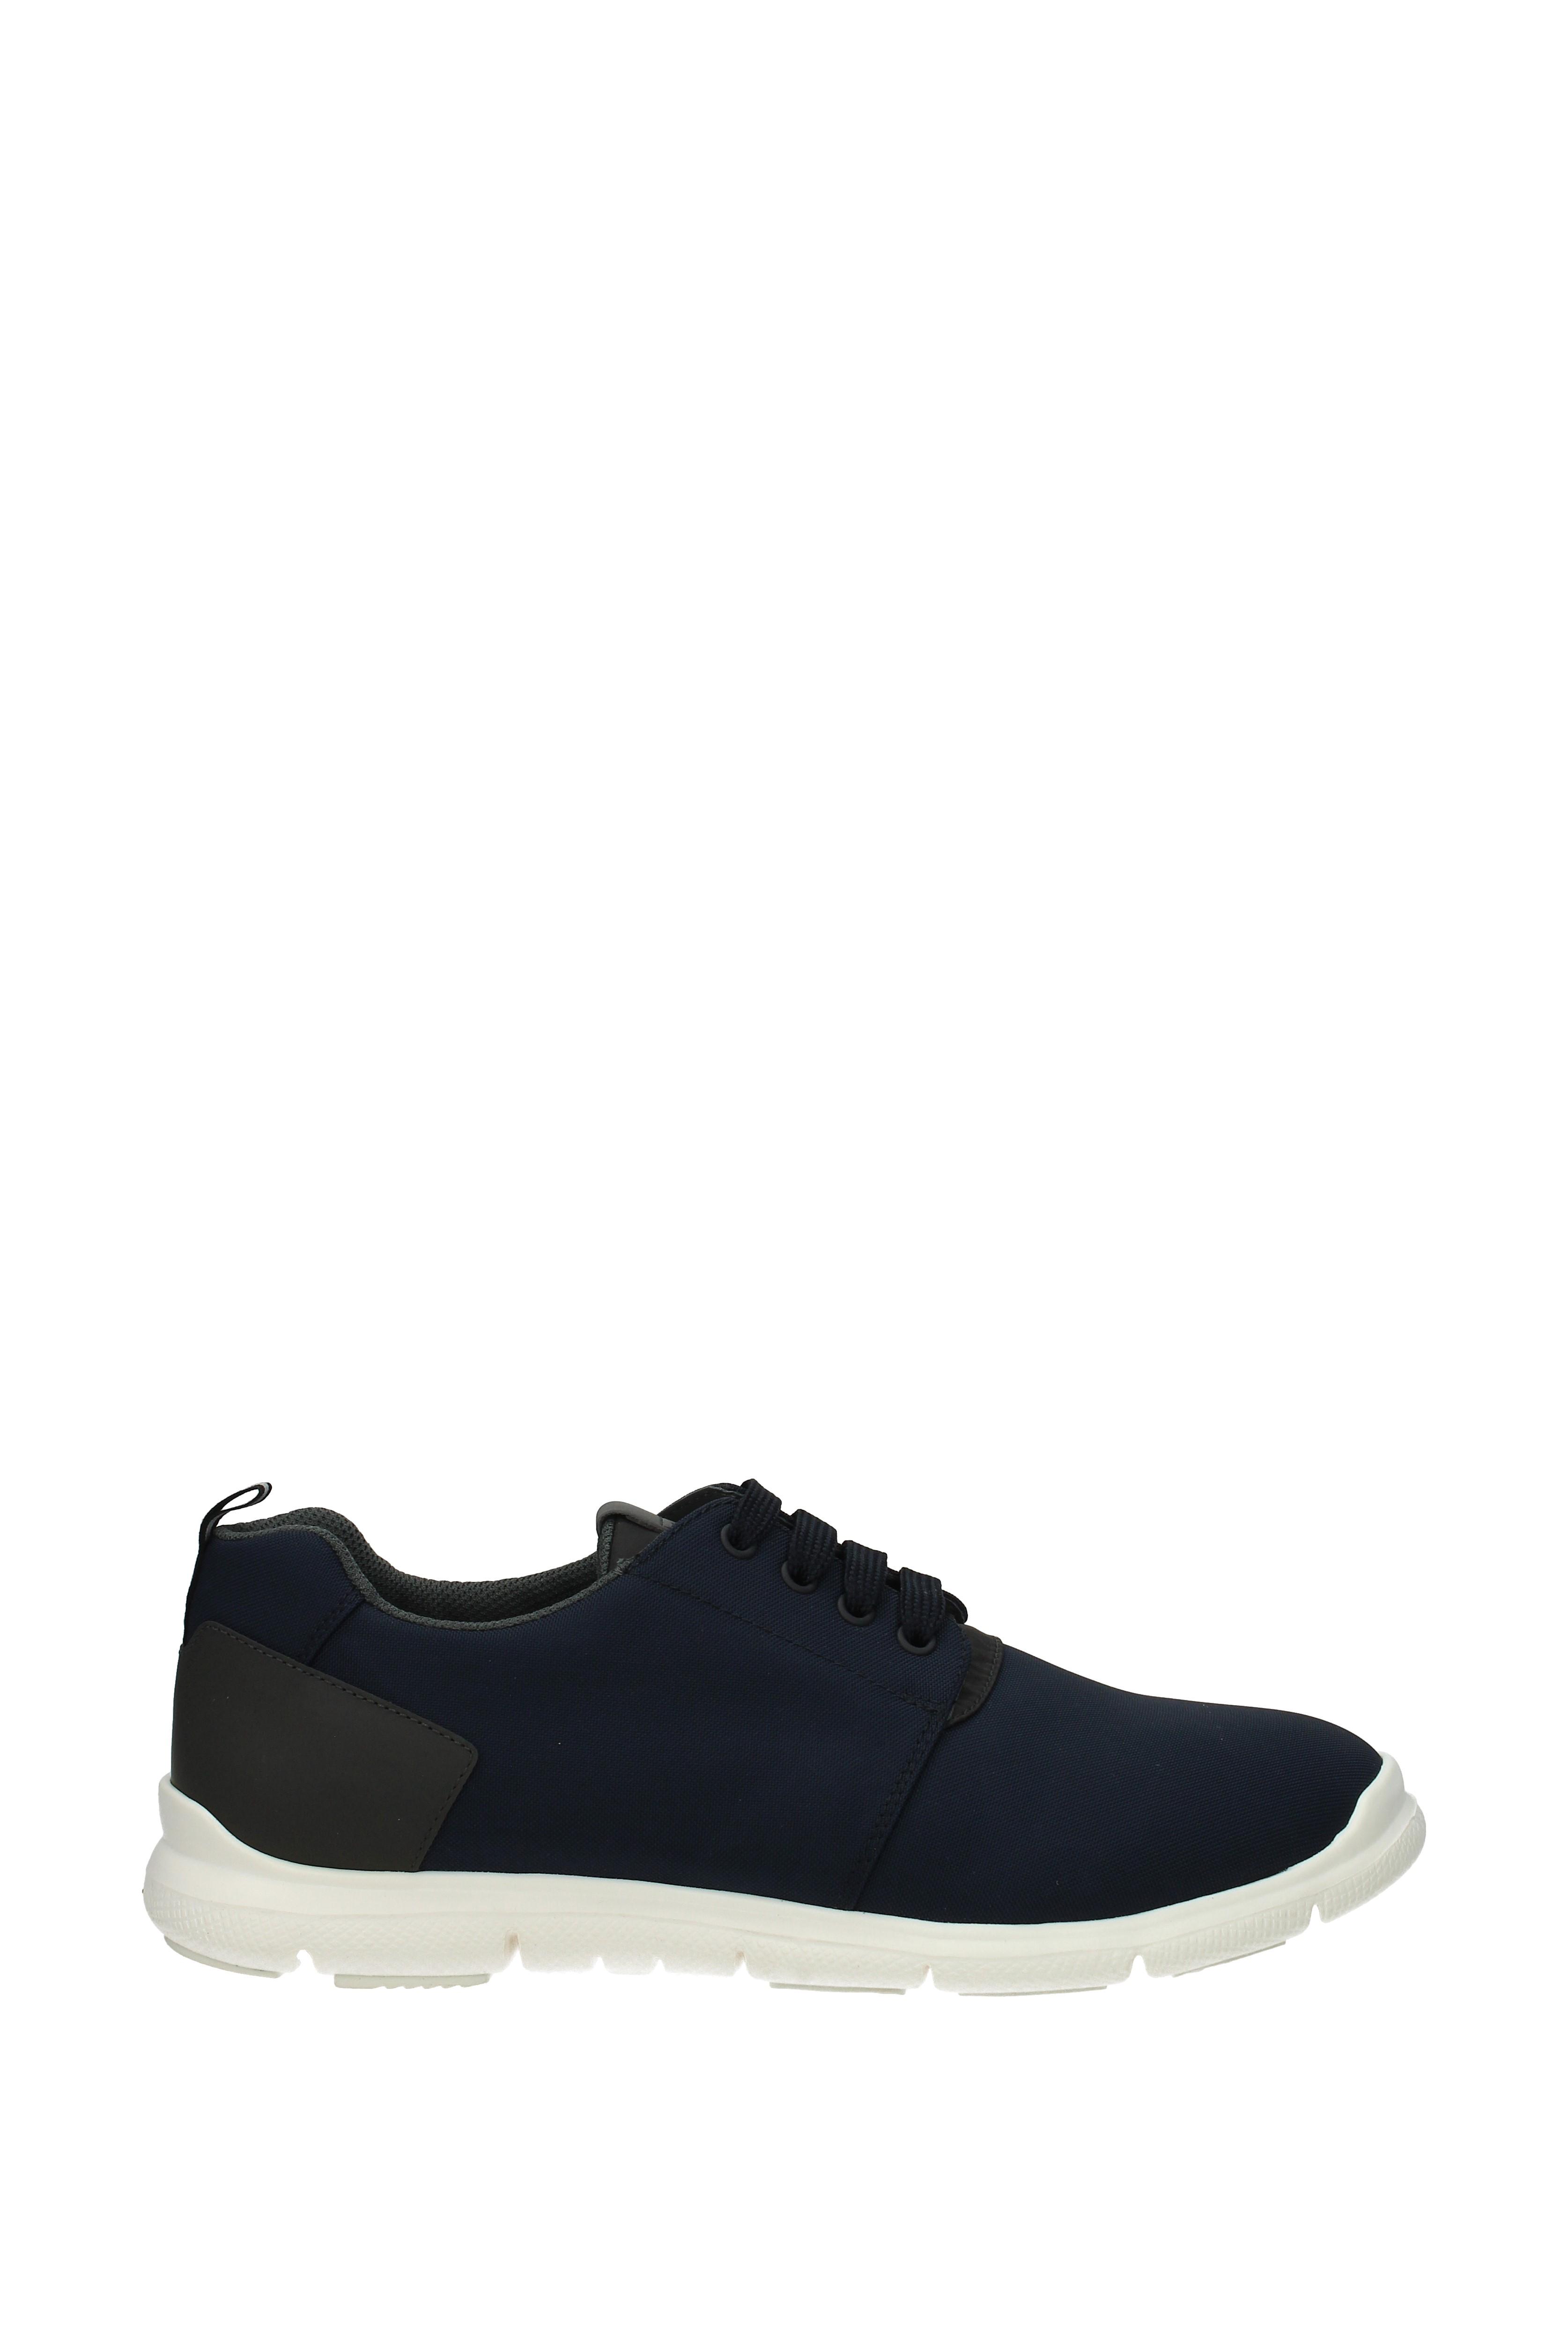 SNEAKERS Car Shoe 880 uomo-sostanza (KUE 880 Shoe nylonrubber) d027f5